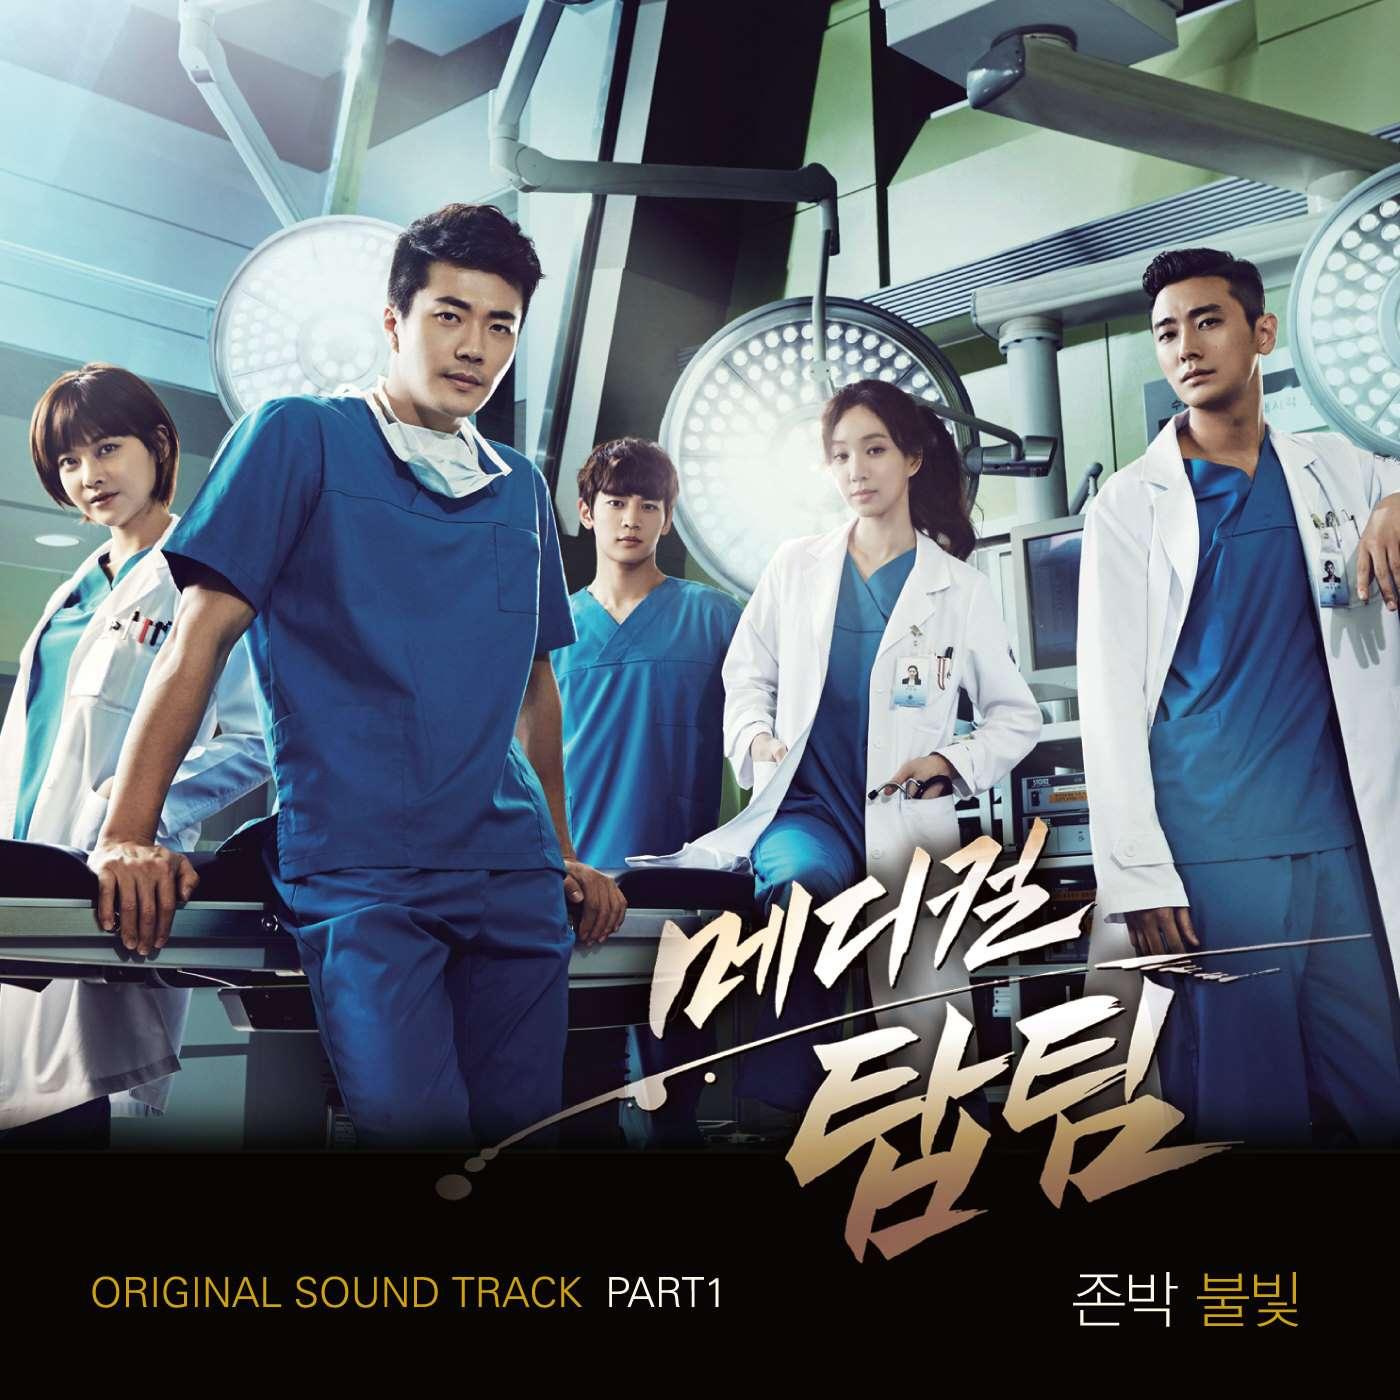 [Single] John Park - Medical Top Team OST Part.1